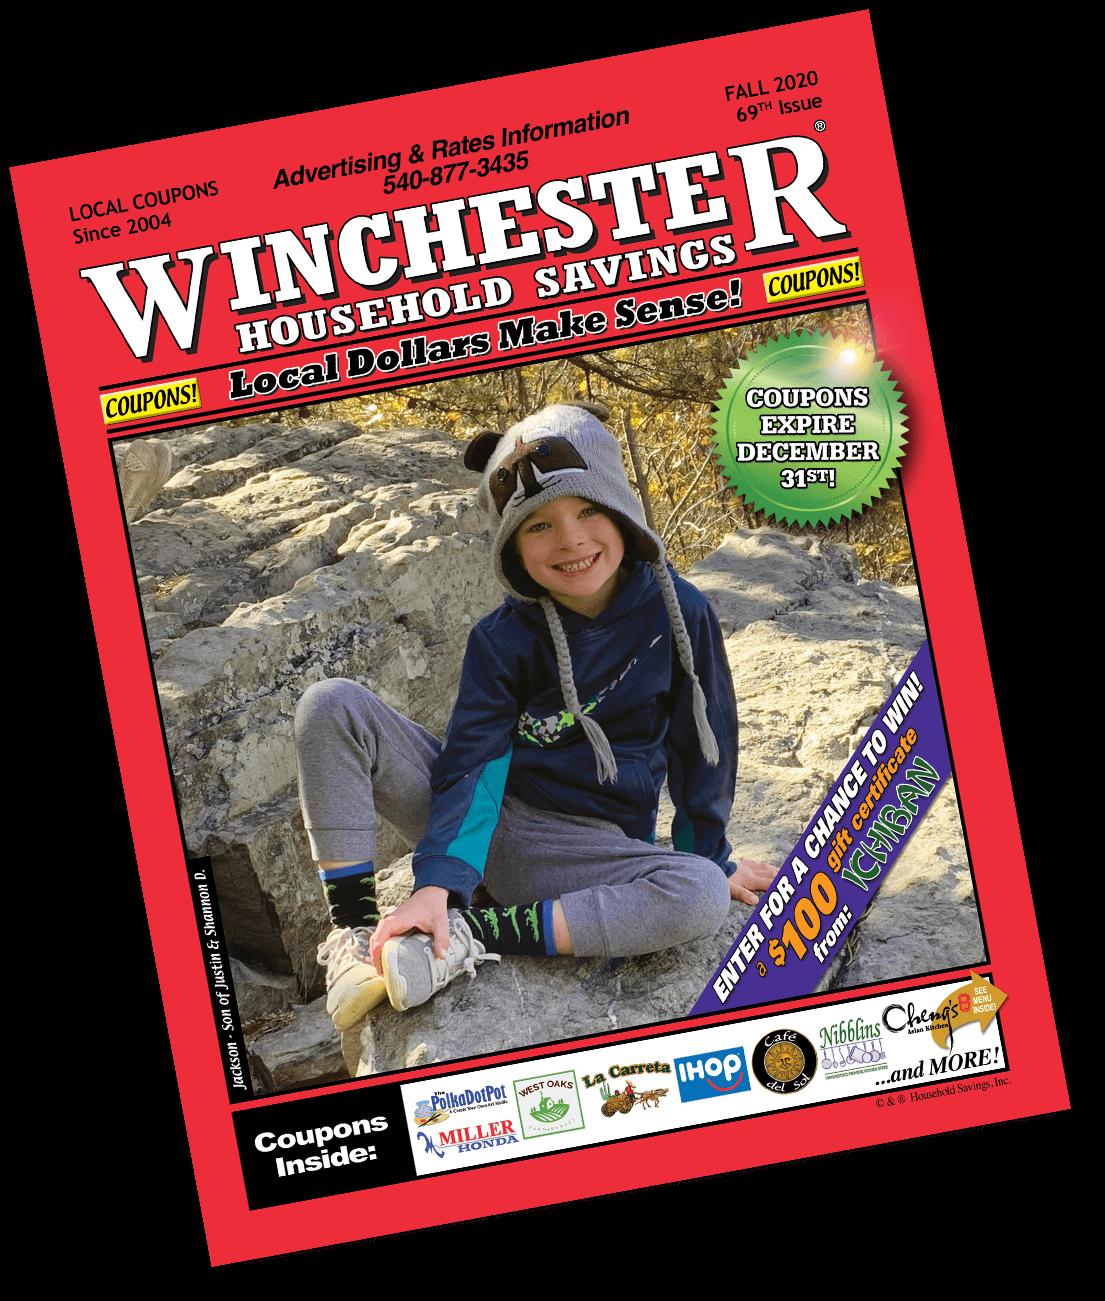 Winchester Household Savings Magazine - Fall 2020 Edition